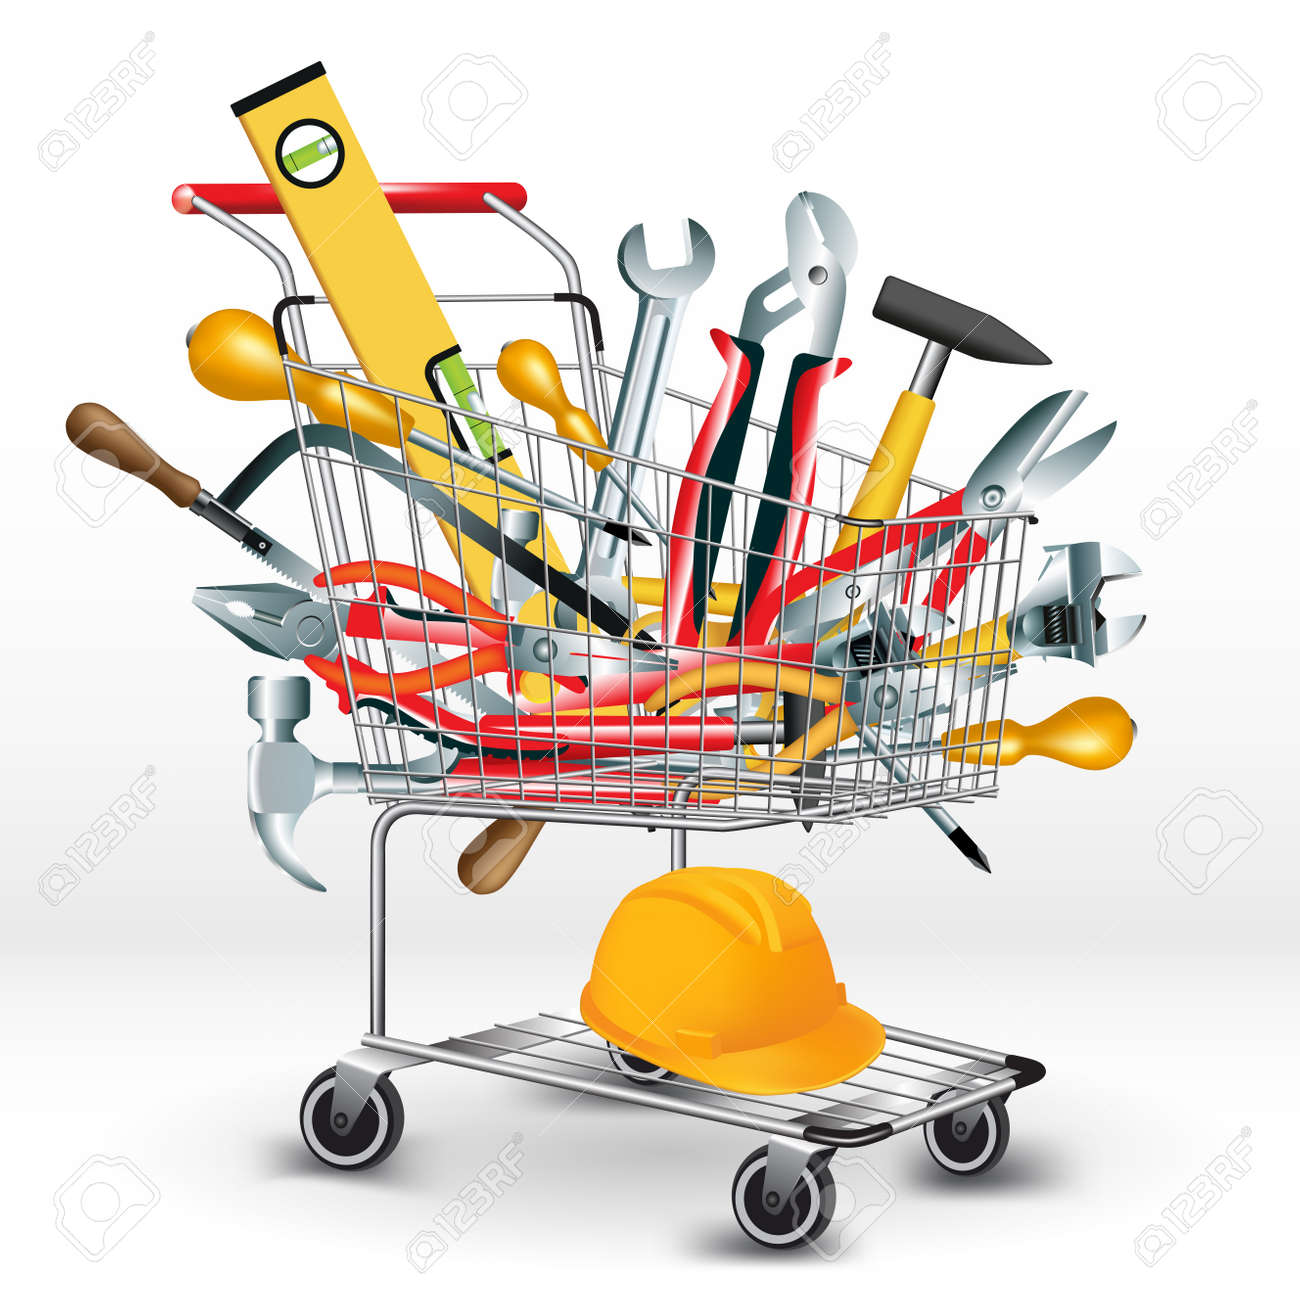 Hand tools inside a shopping cart. Vector illustration - 46534212